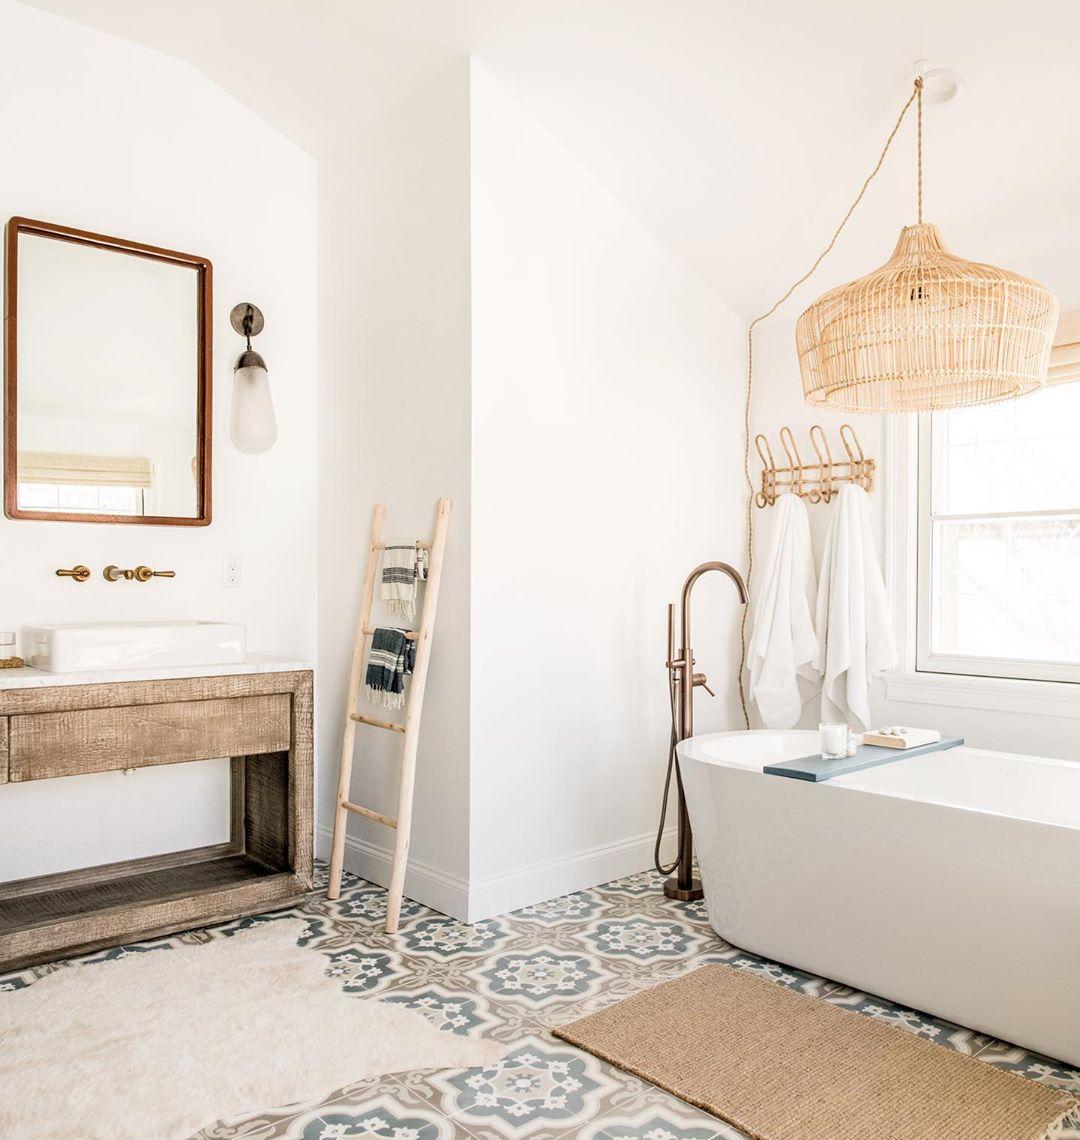 Bathroom with patterned tile floor